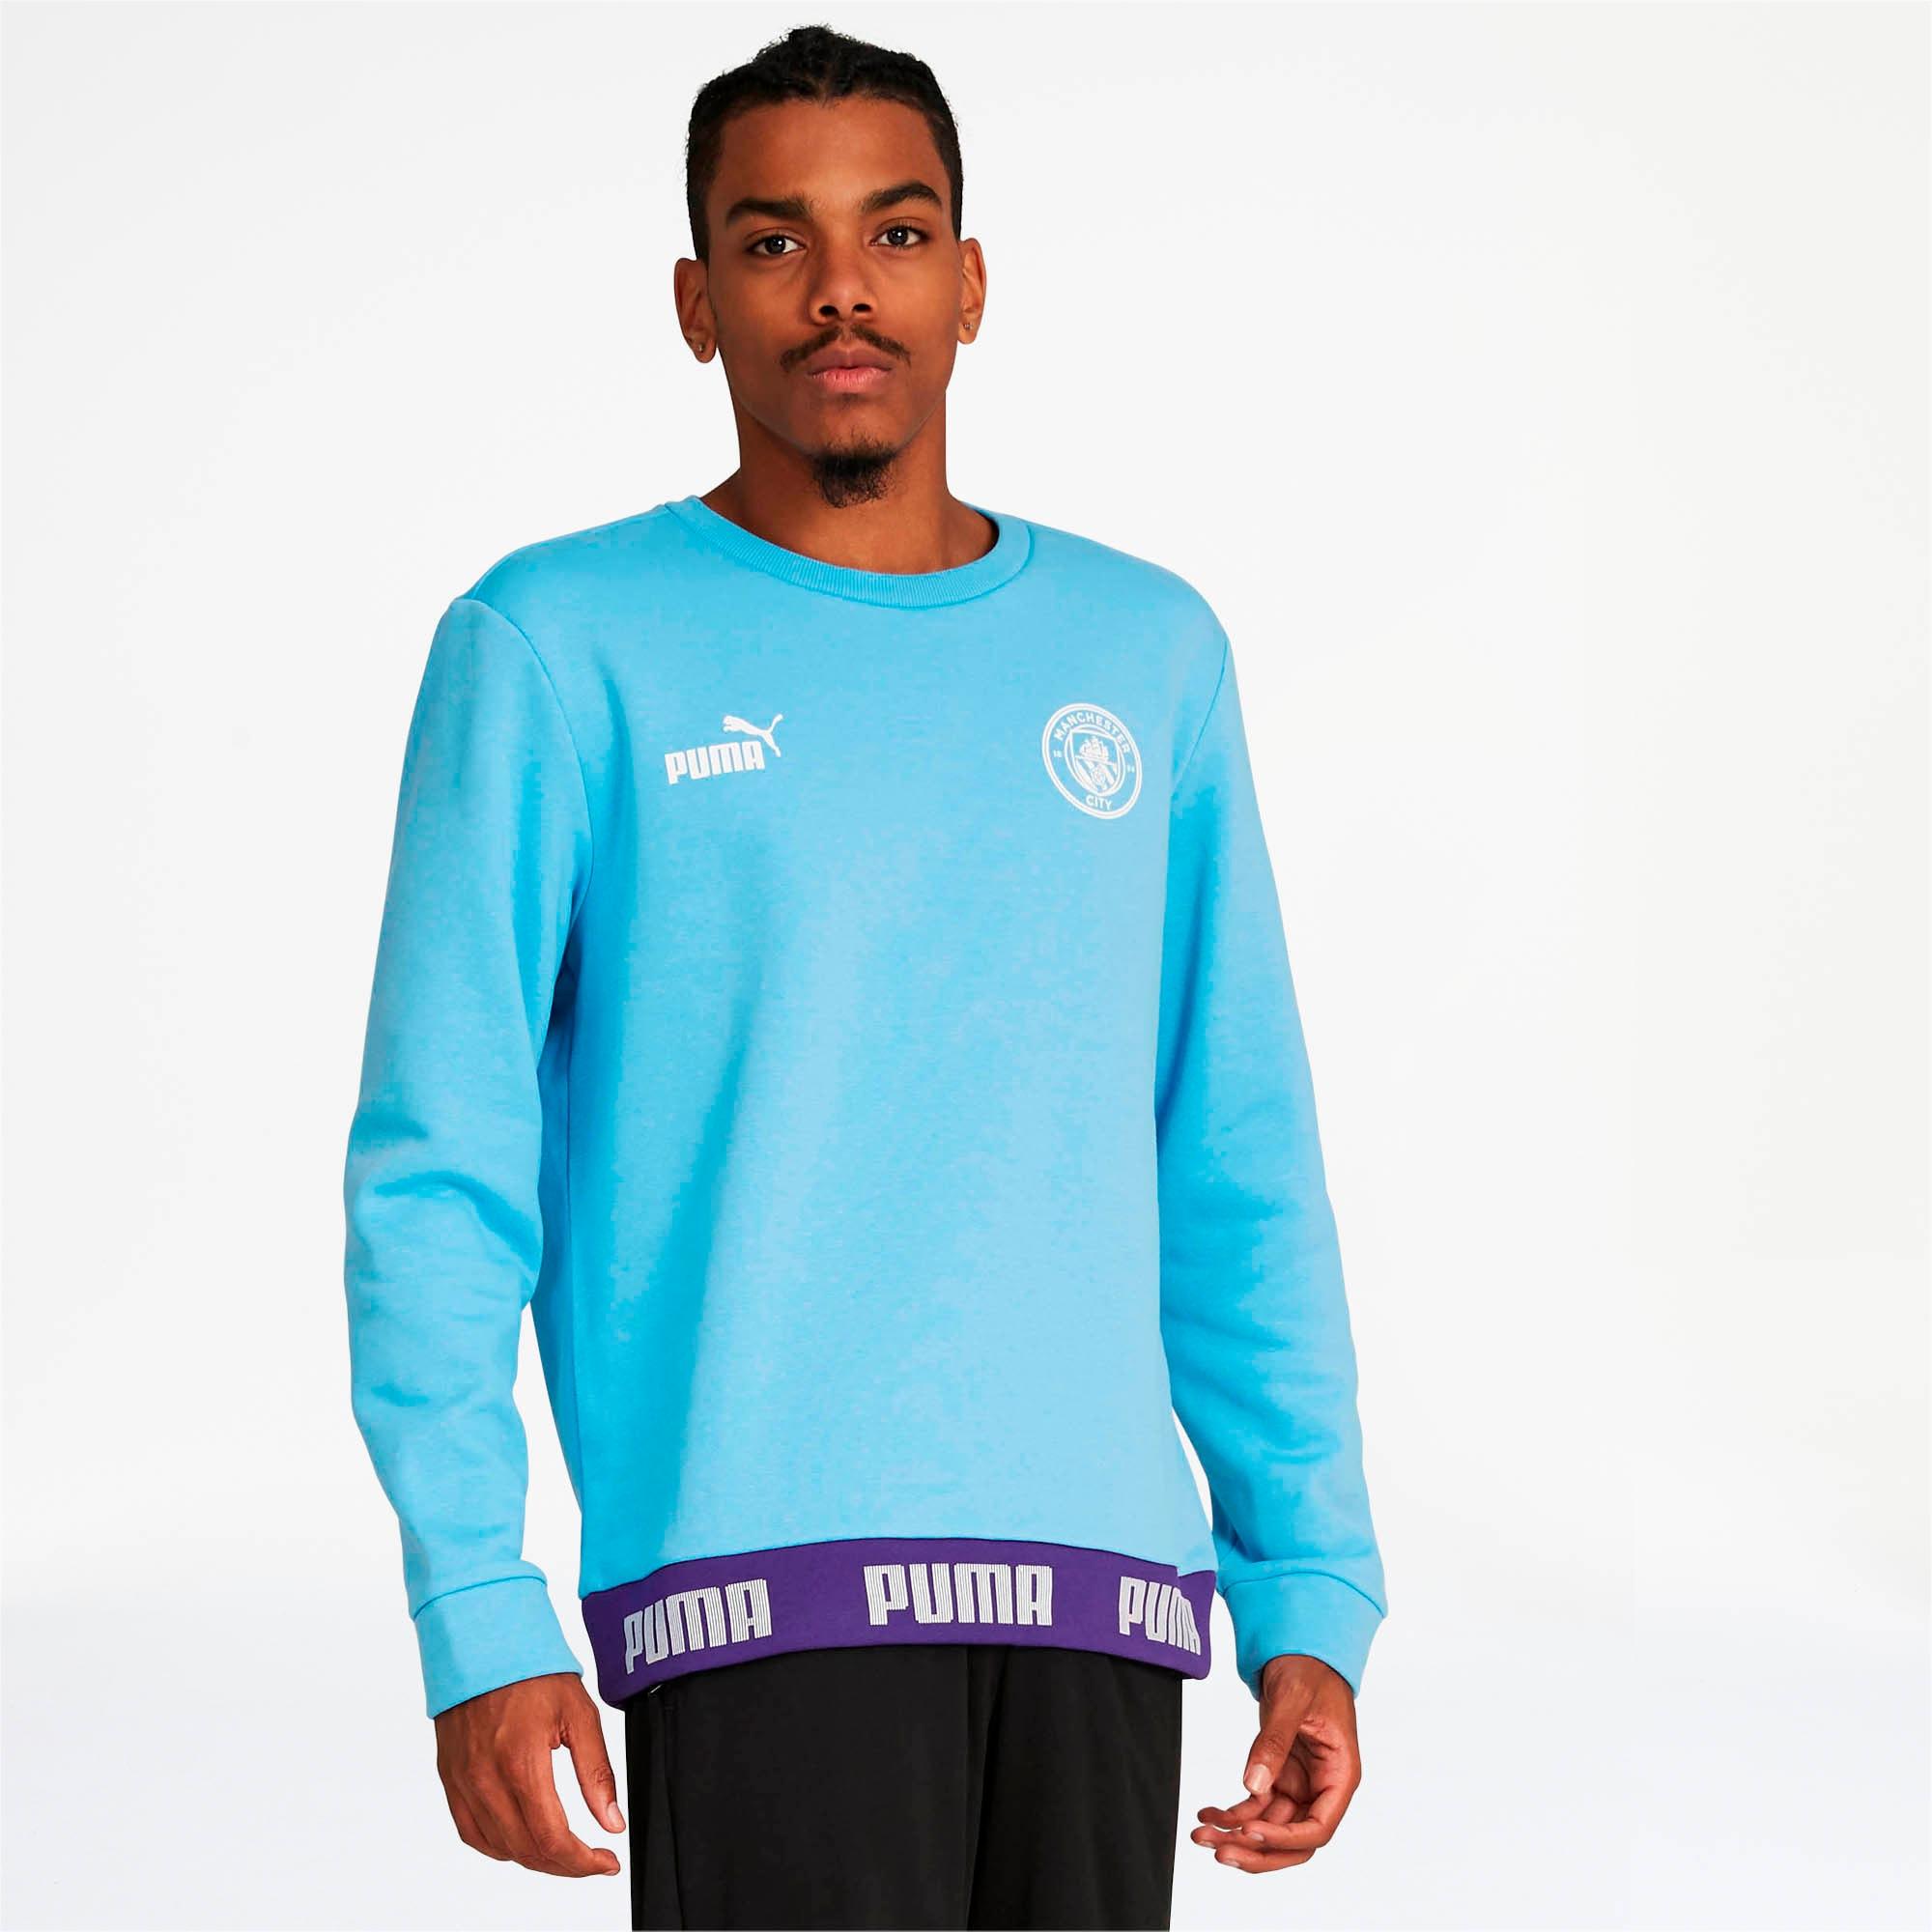 Thumbnail 1 of Manchester City FC FtblCulture Men's Sweatshirt, Team Light Blue-Puma White, medium